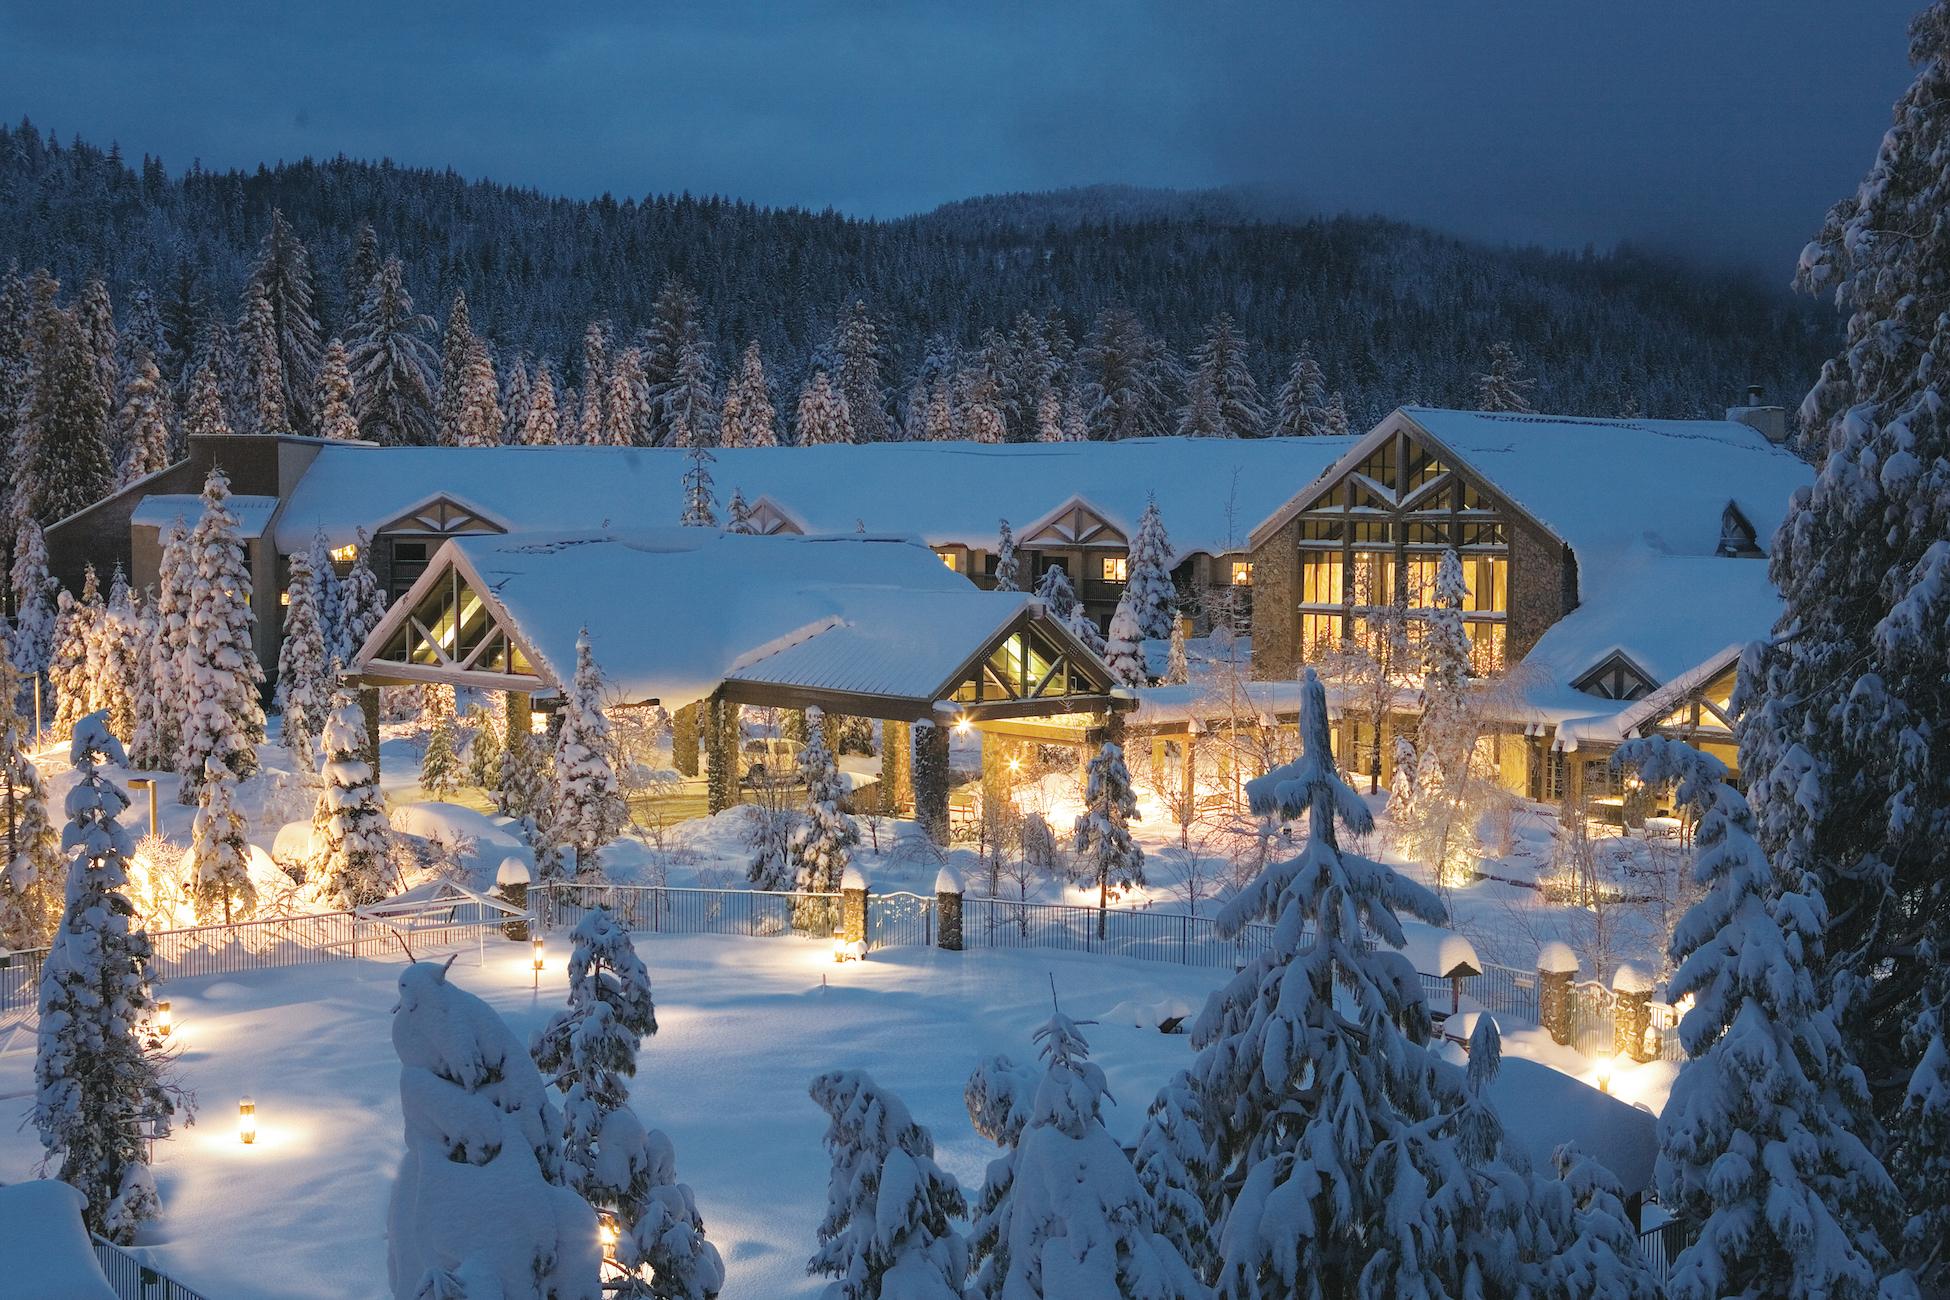 Free Multnoma Falls Winter Wallpaper Snowy Fun And High Sierra Romance Create Ultimate Winter